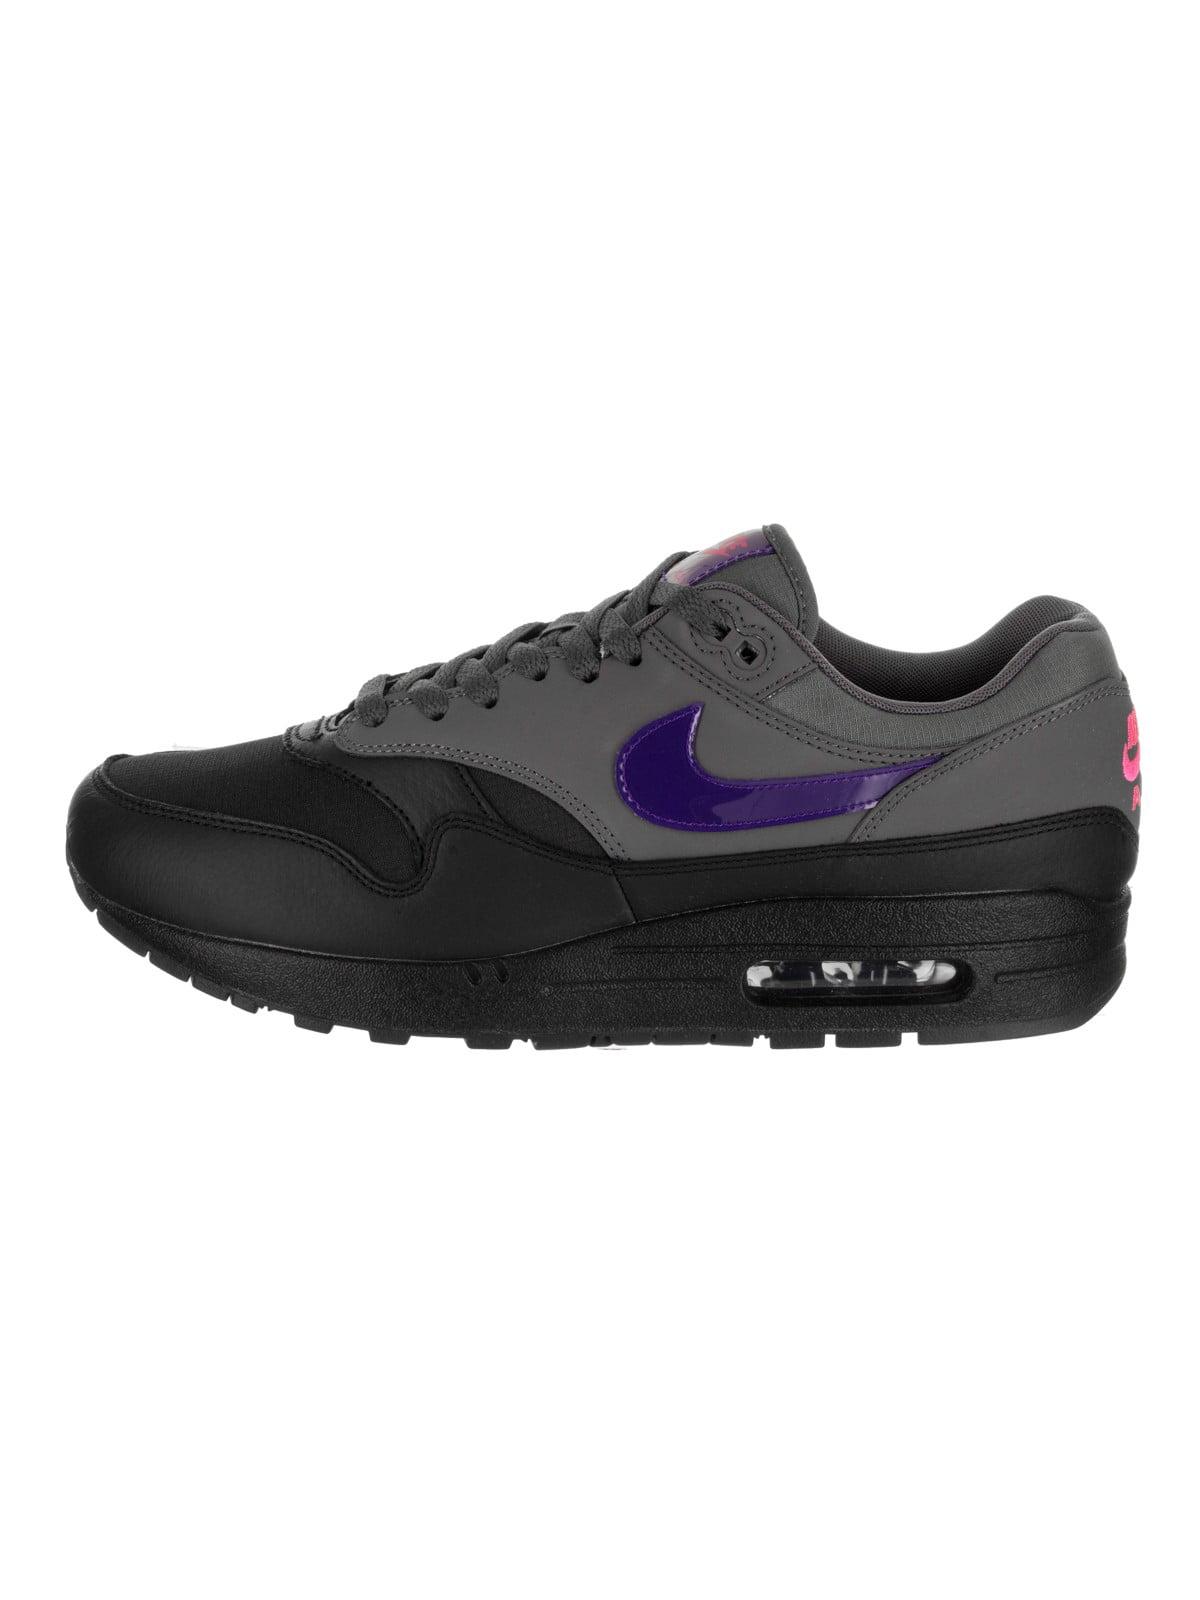 buy popular 4e01d 89bd0 Nike - Mens Nike Air Max 1 Miami Nights Black Dark Grey Fierce ...